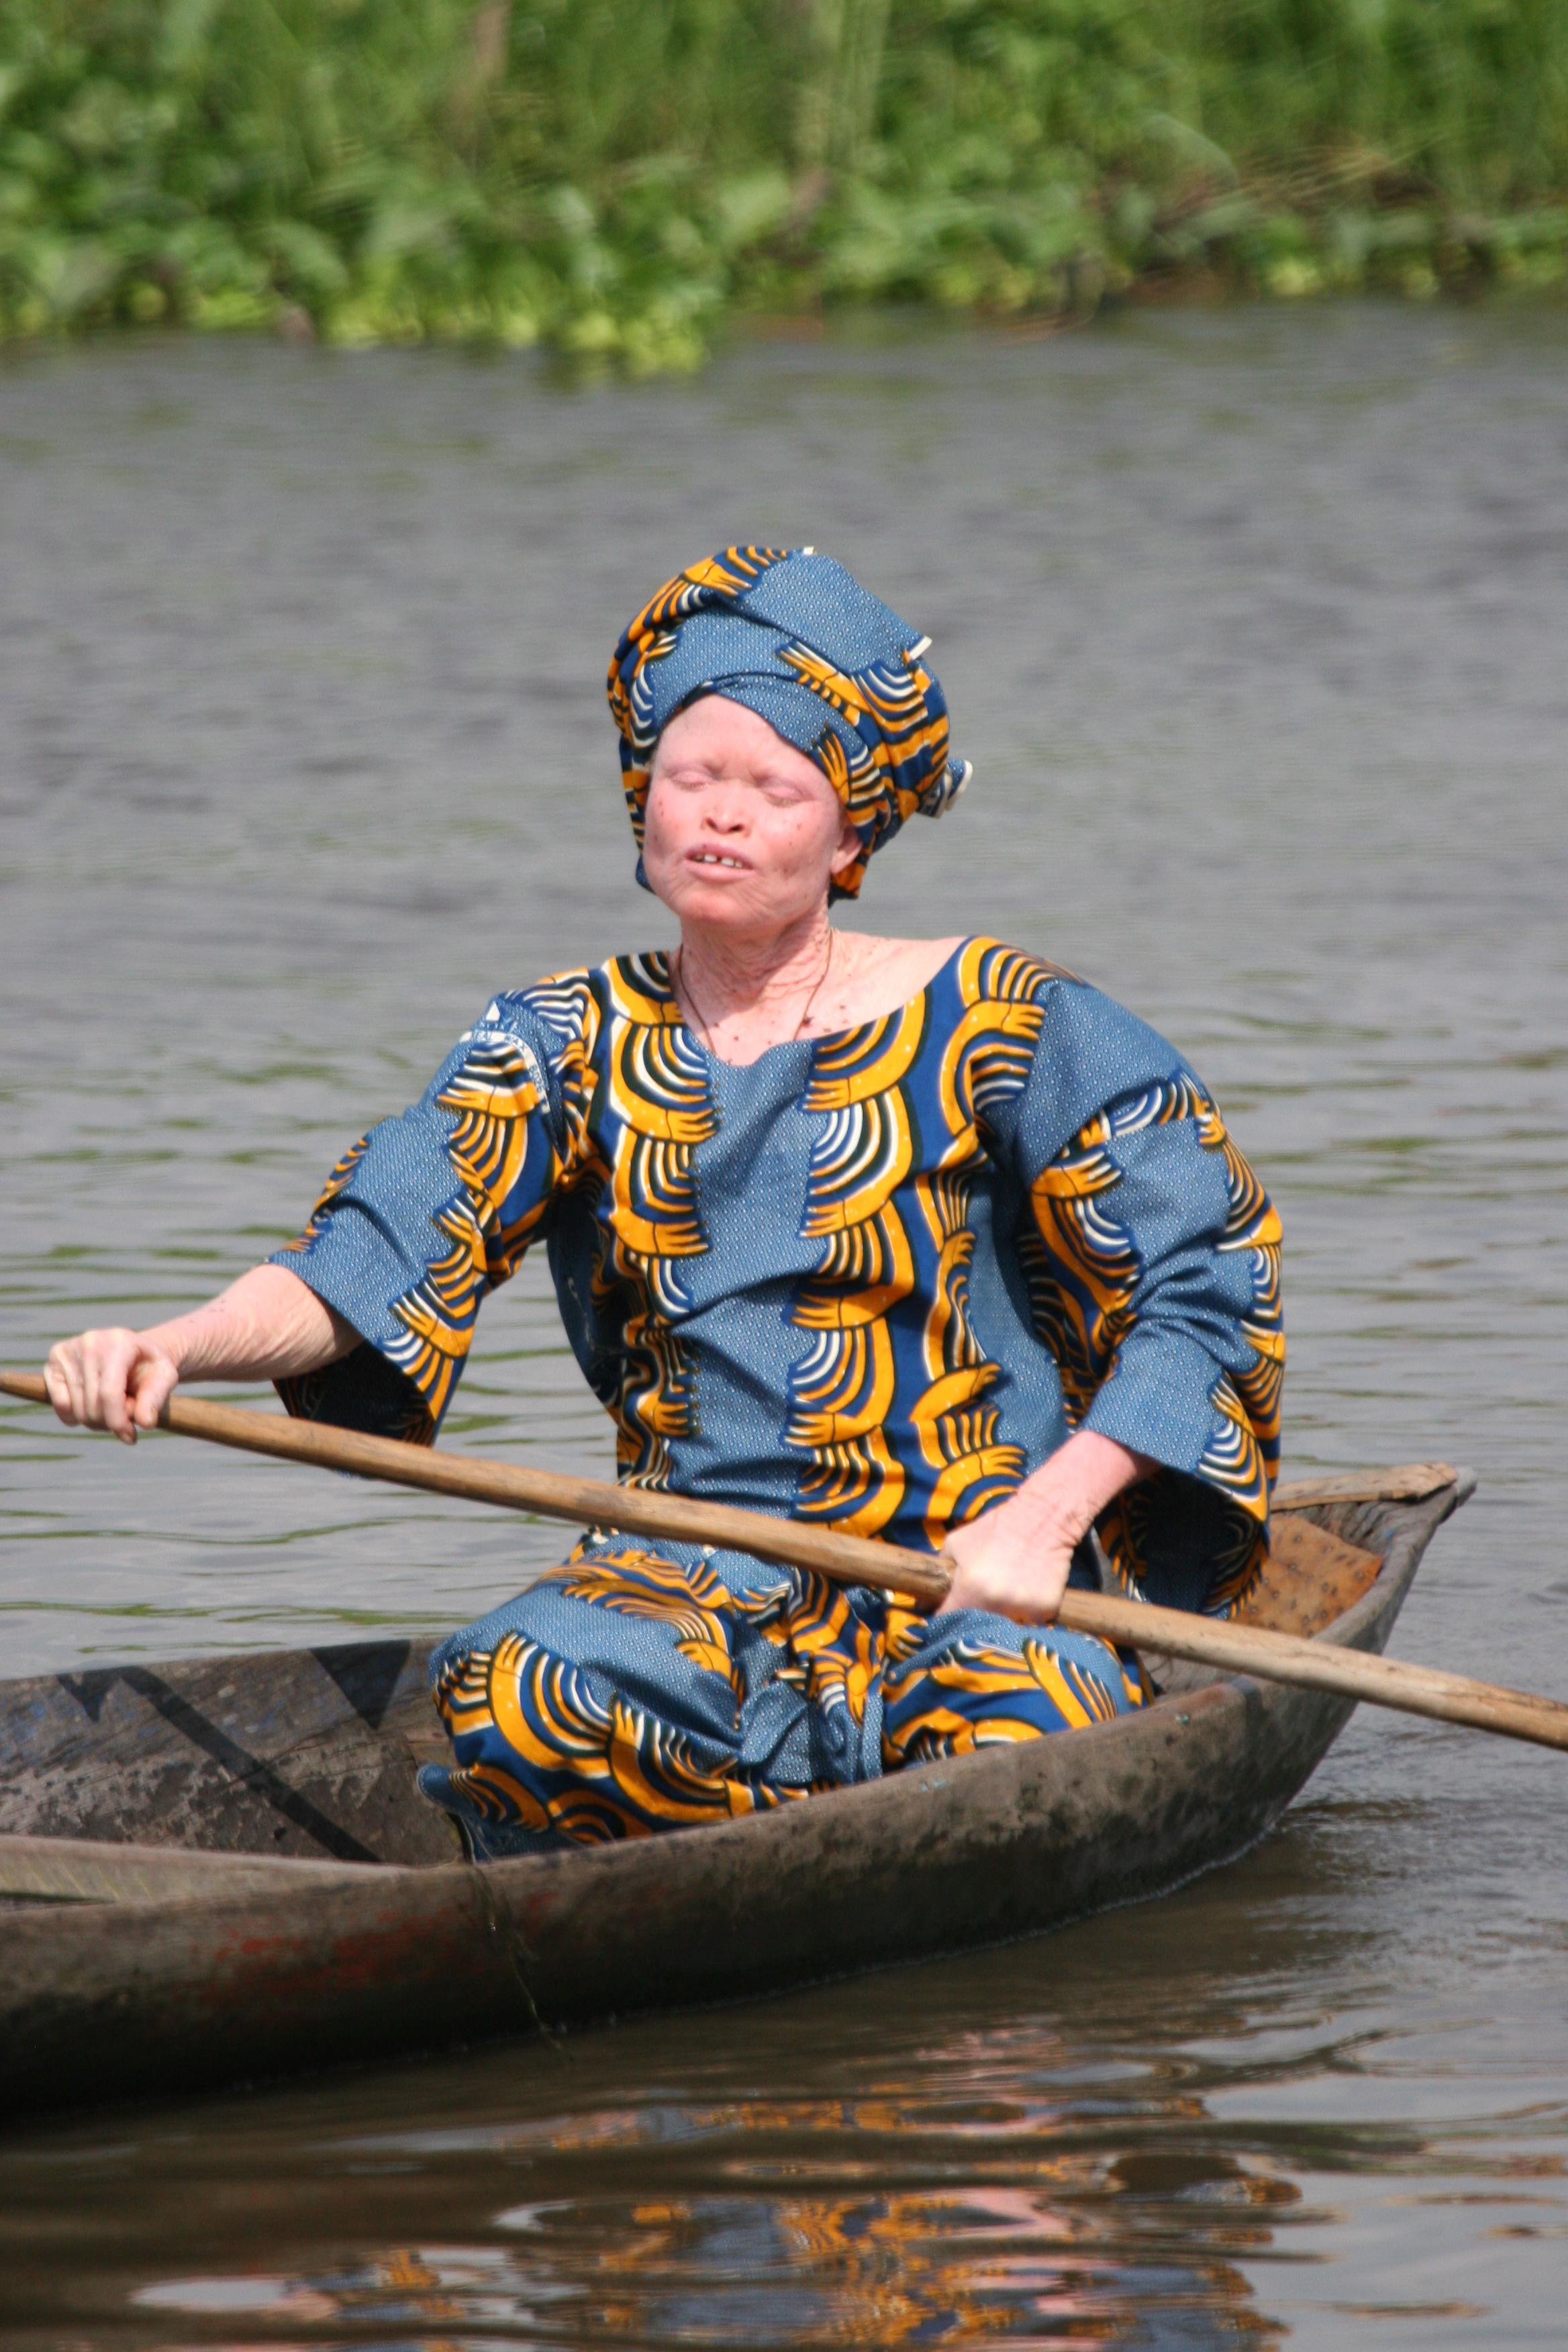 Frau mit Albinismus in Benin. (Quelle: Ferdinand Reus via Wikimedia Commons unter CC-BY-SA 2.0 Lizenz)